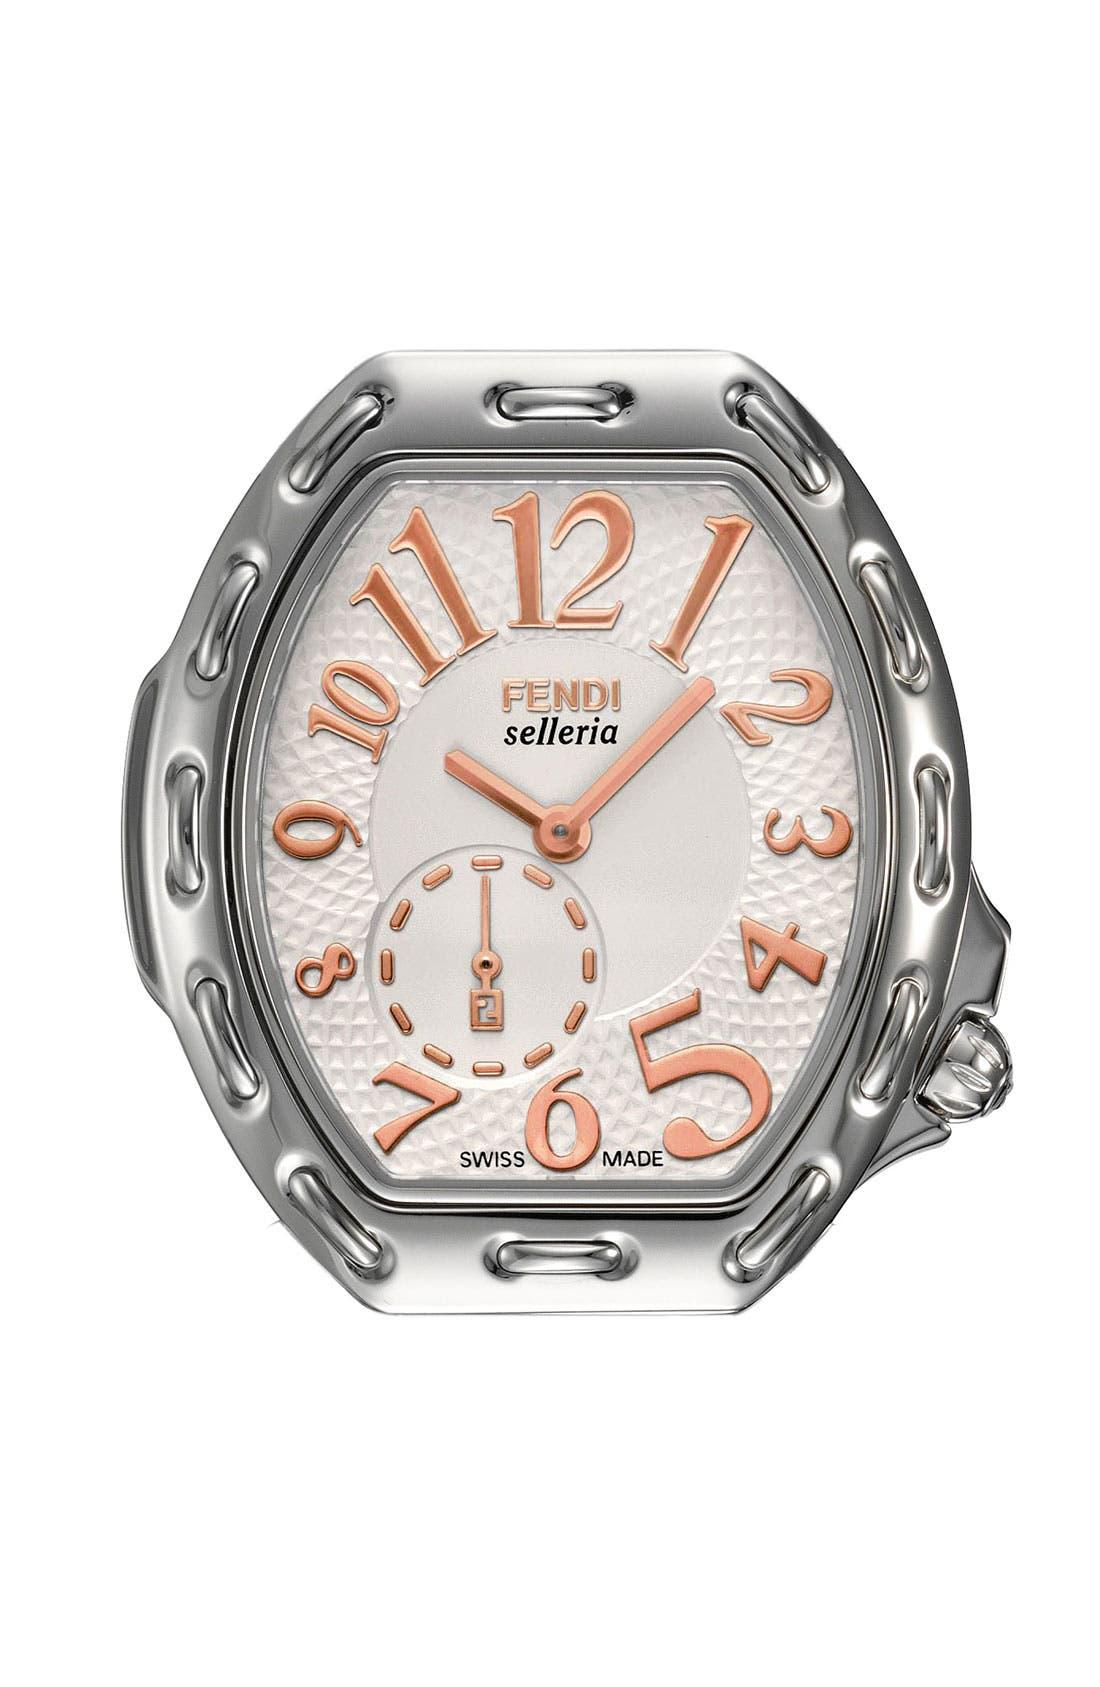 Alternate Image 1 Selected - Fendi 'Selleria' Tonneau Watch Case, 33mm x 38mm